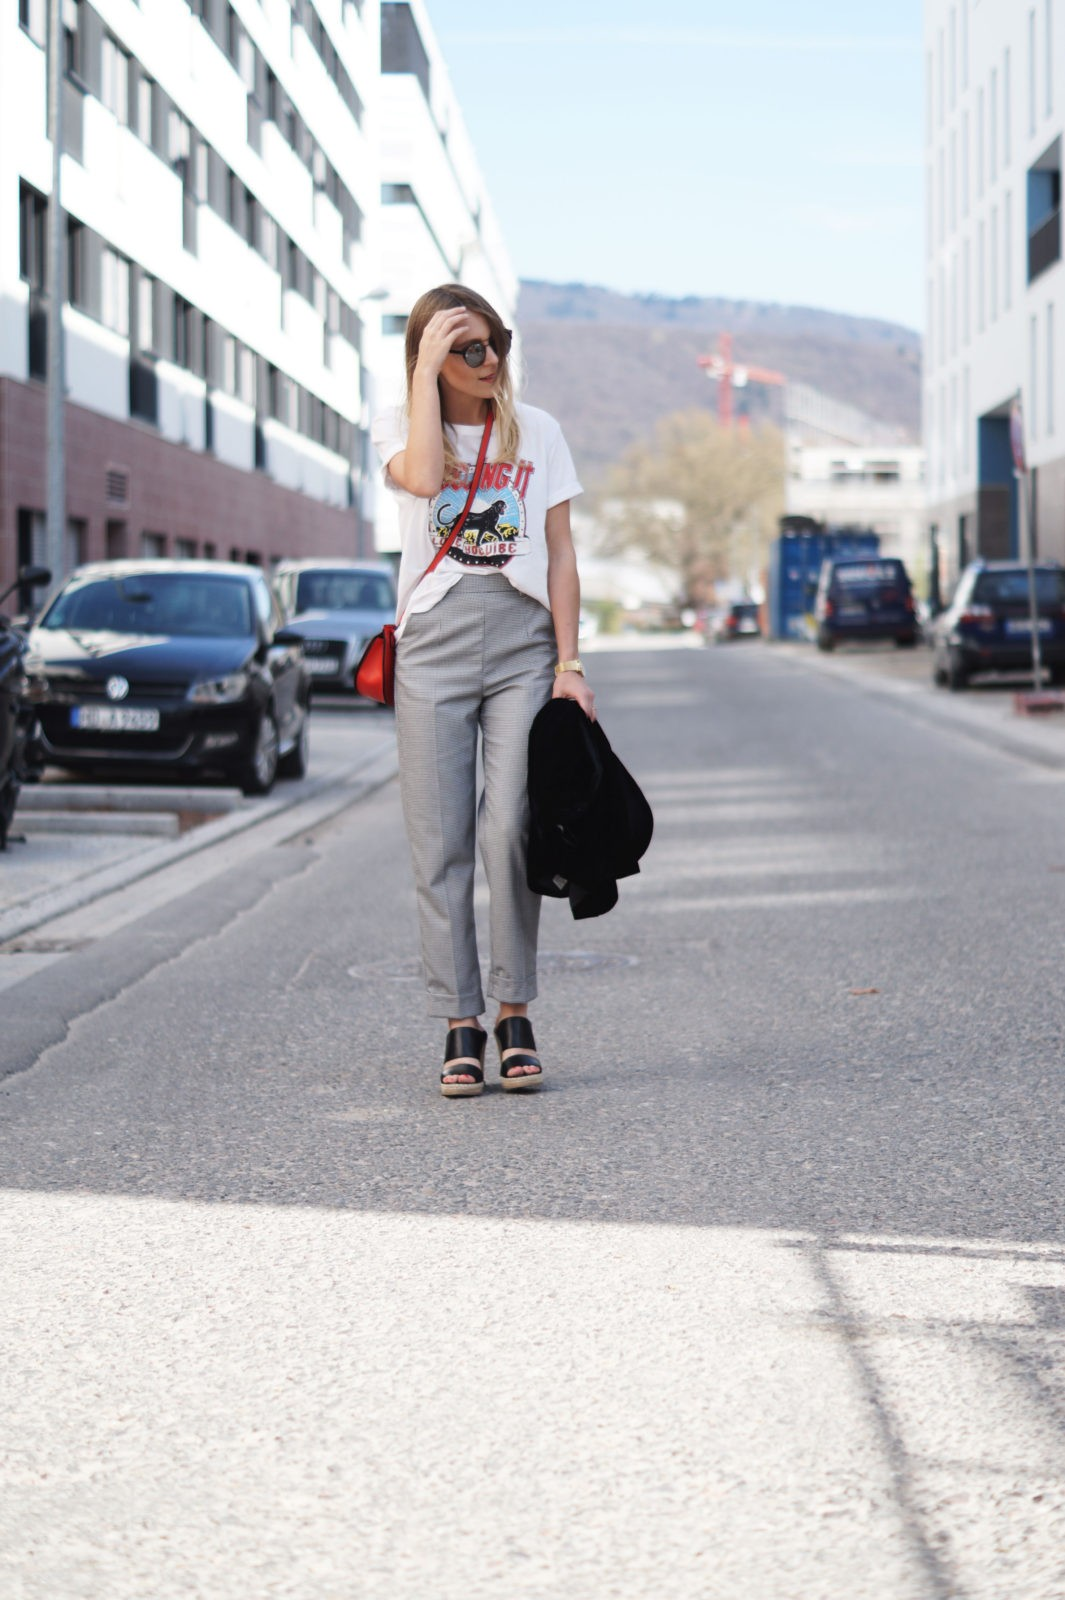 Slogan Shirt Pop of Red Outfit Fashionblogger Sariety Modeblog Heidelberg Bandshirt Karohose rote Tasche Bahnstadt Streetstyle